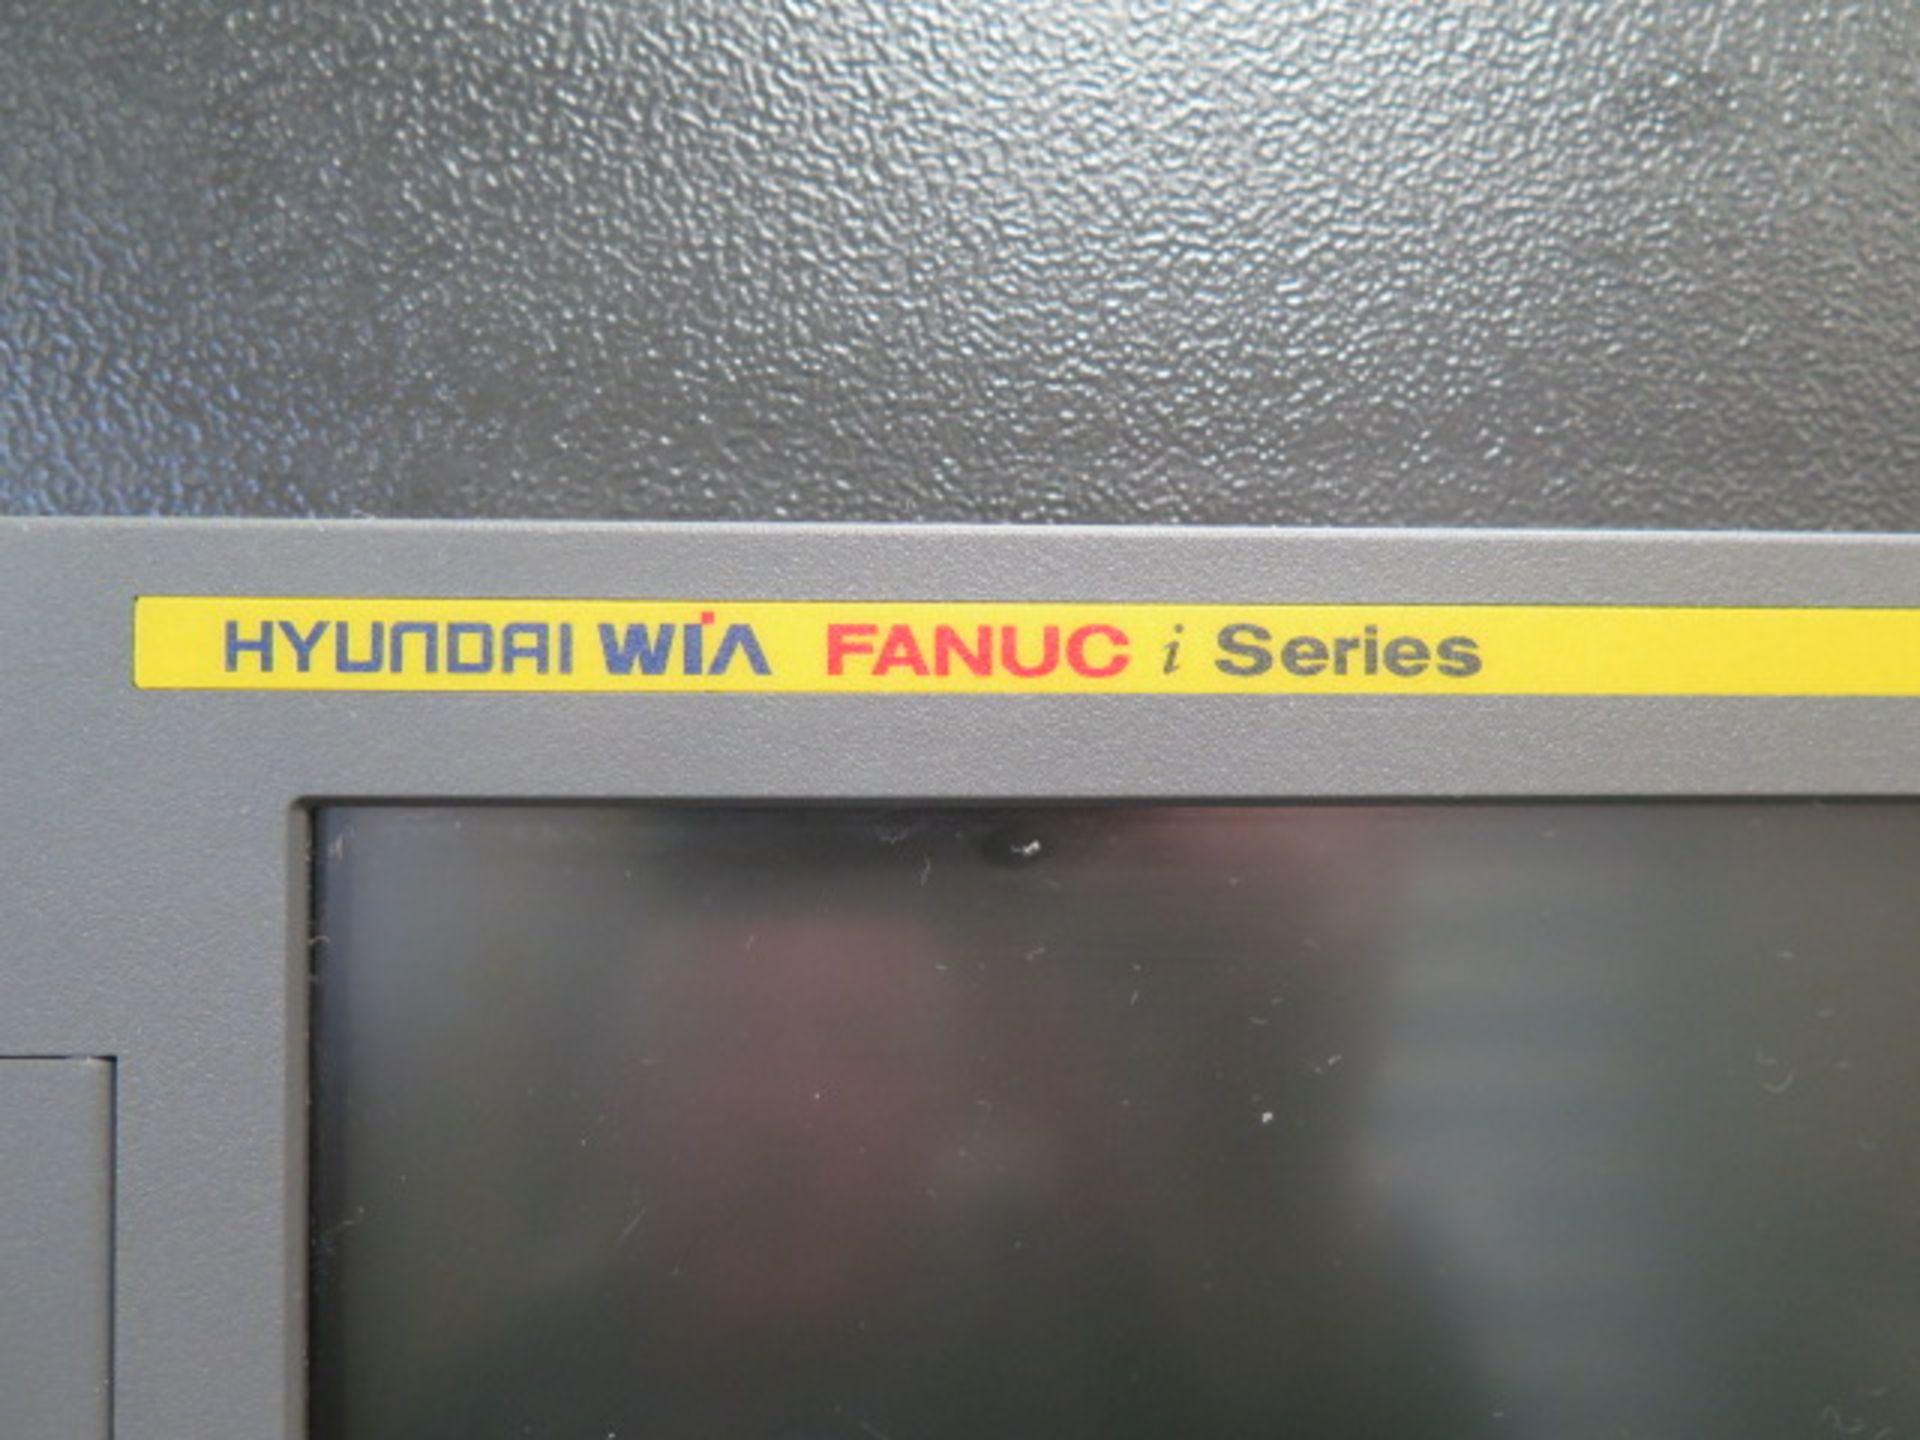 2017 Hyundai WIA KF5600 CNC VMC s/n G2689-0086 w/ Hyundai WIA Fanuc i-Series, SOLD AS IS - Image 7 of 22